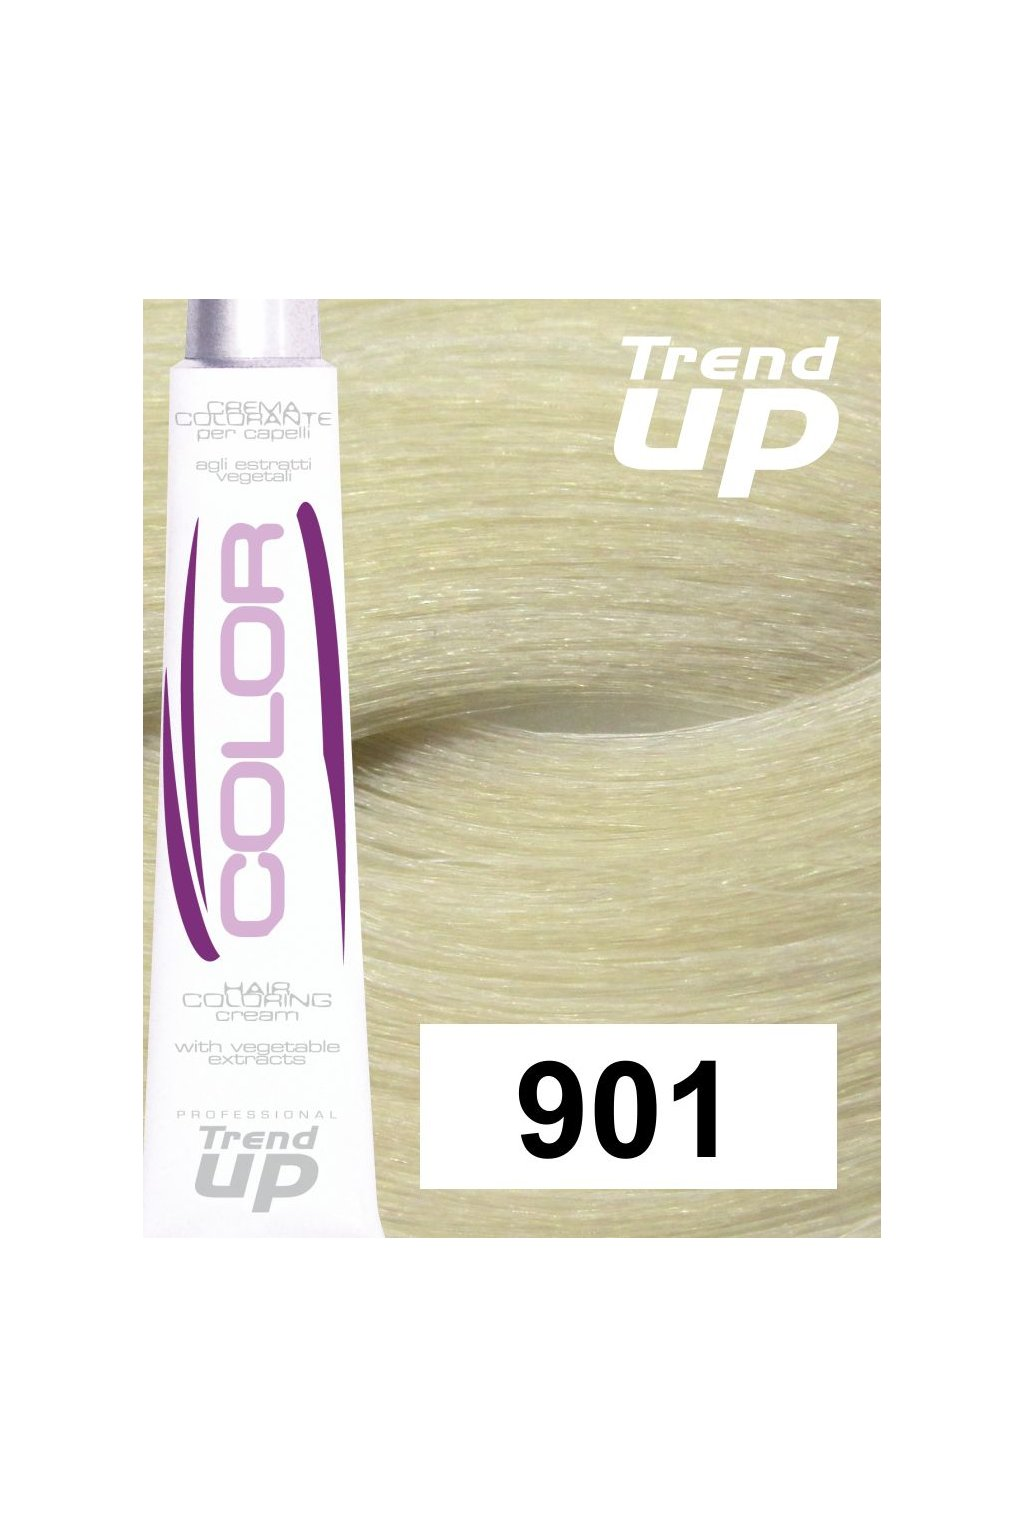 901 TU